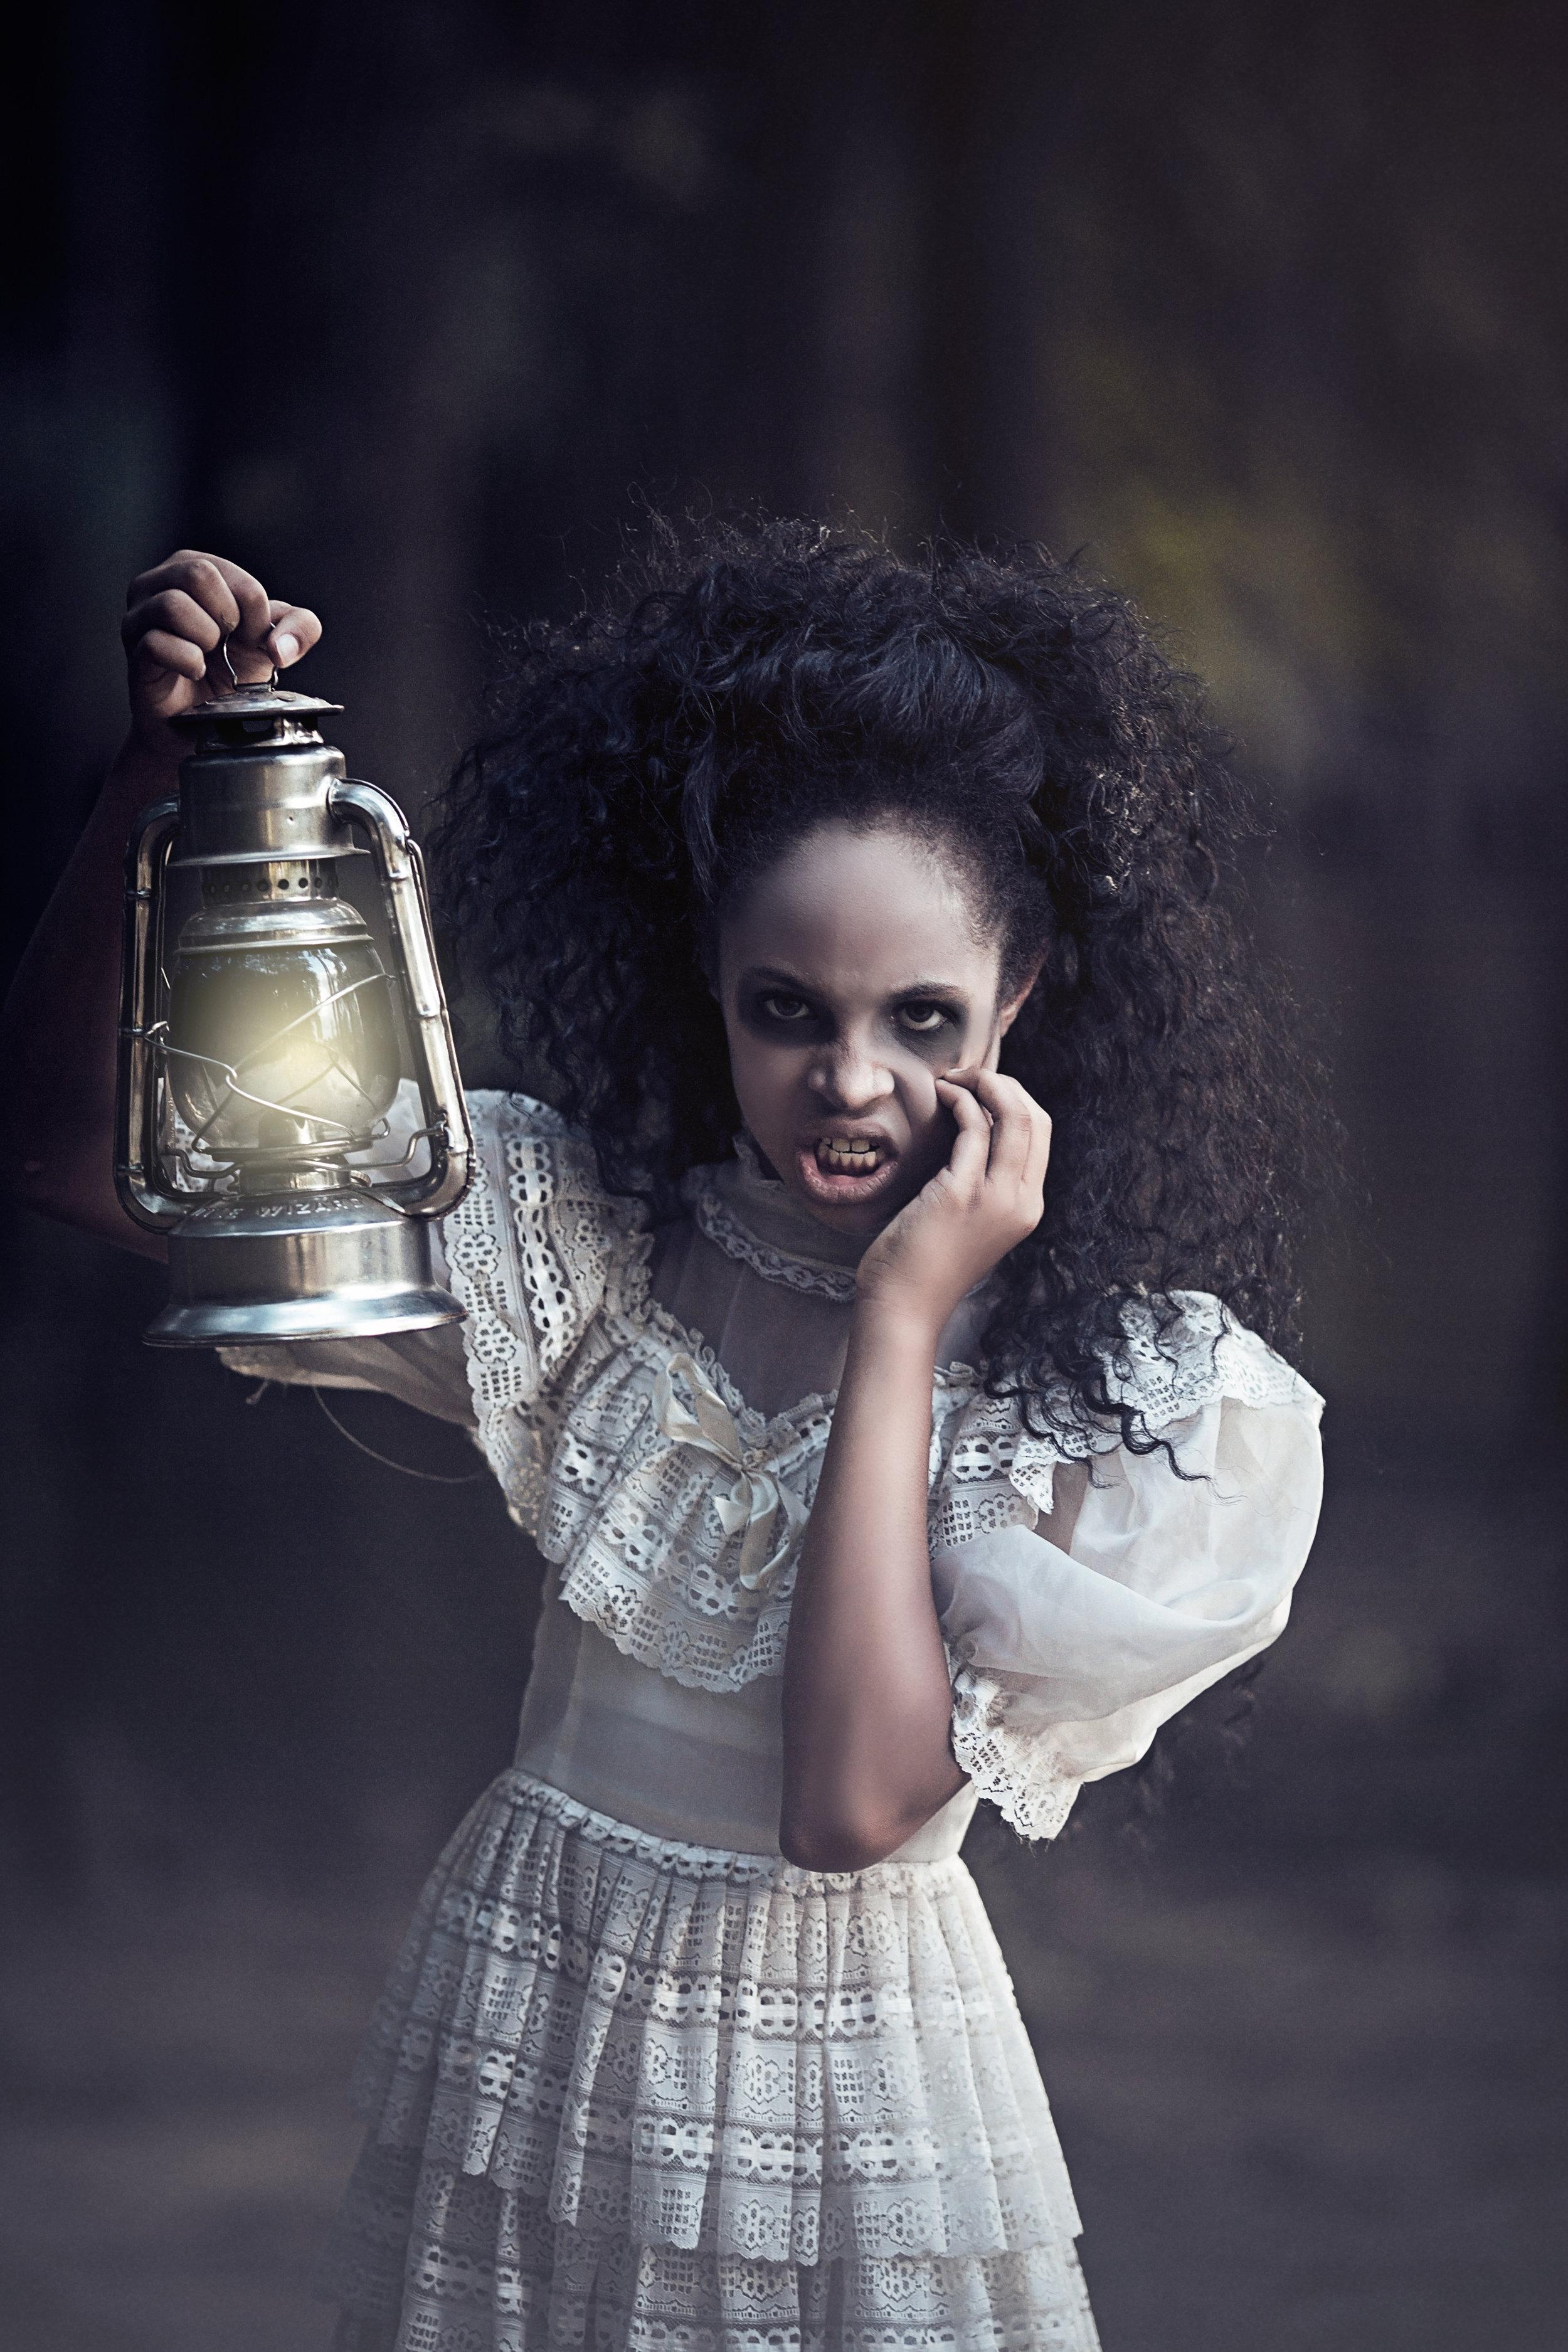 Houston Child Fashion Photographer | Maribella Portraits, LLC | www.maribellaportraits.rocks